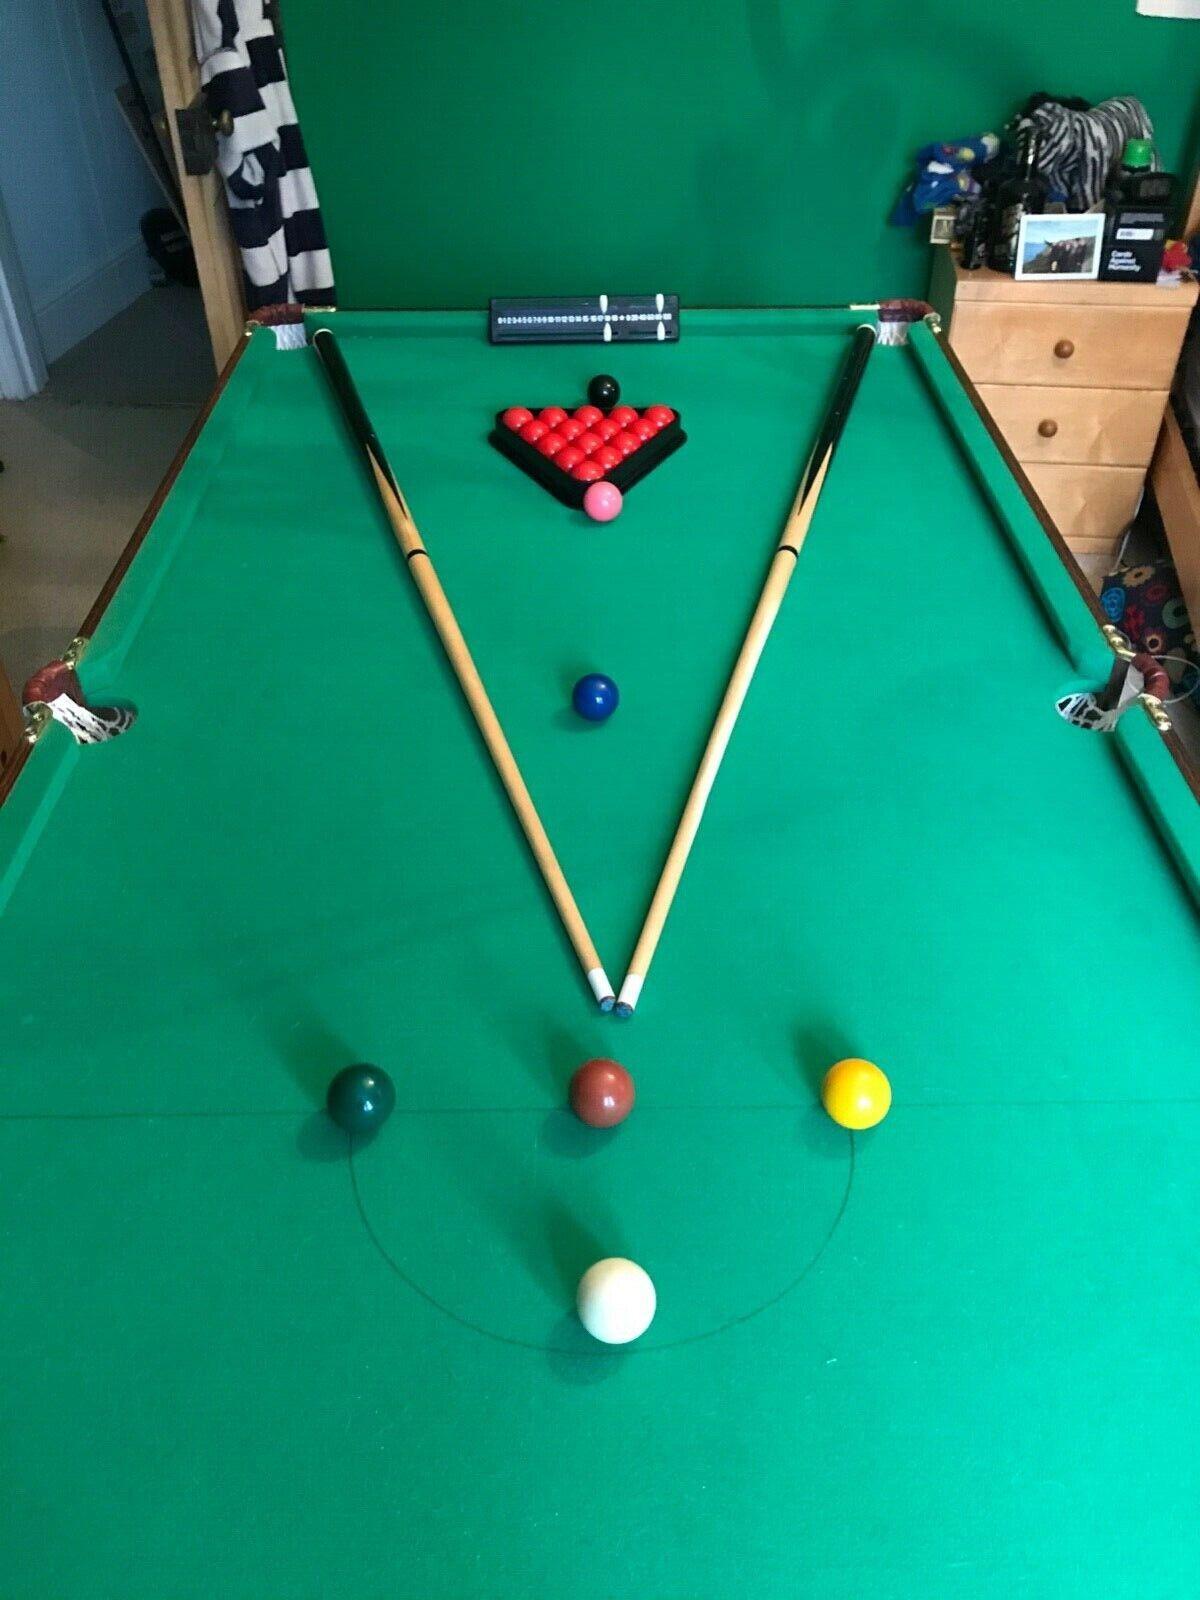 6ft x 3ft folding snooker / pool table